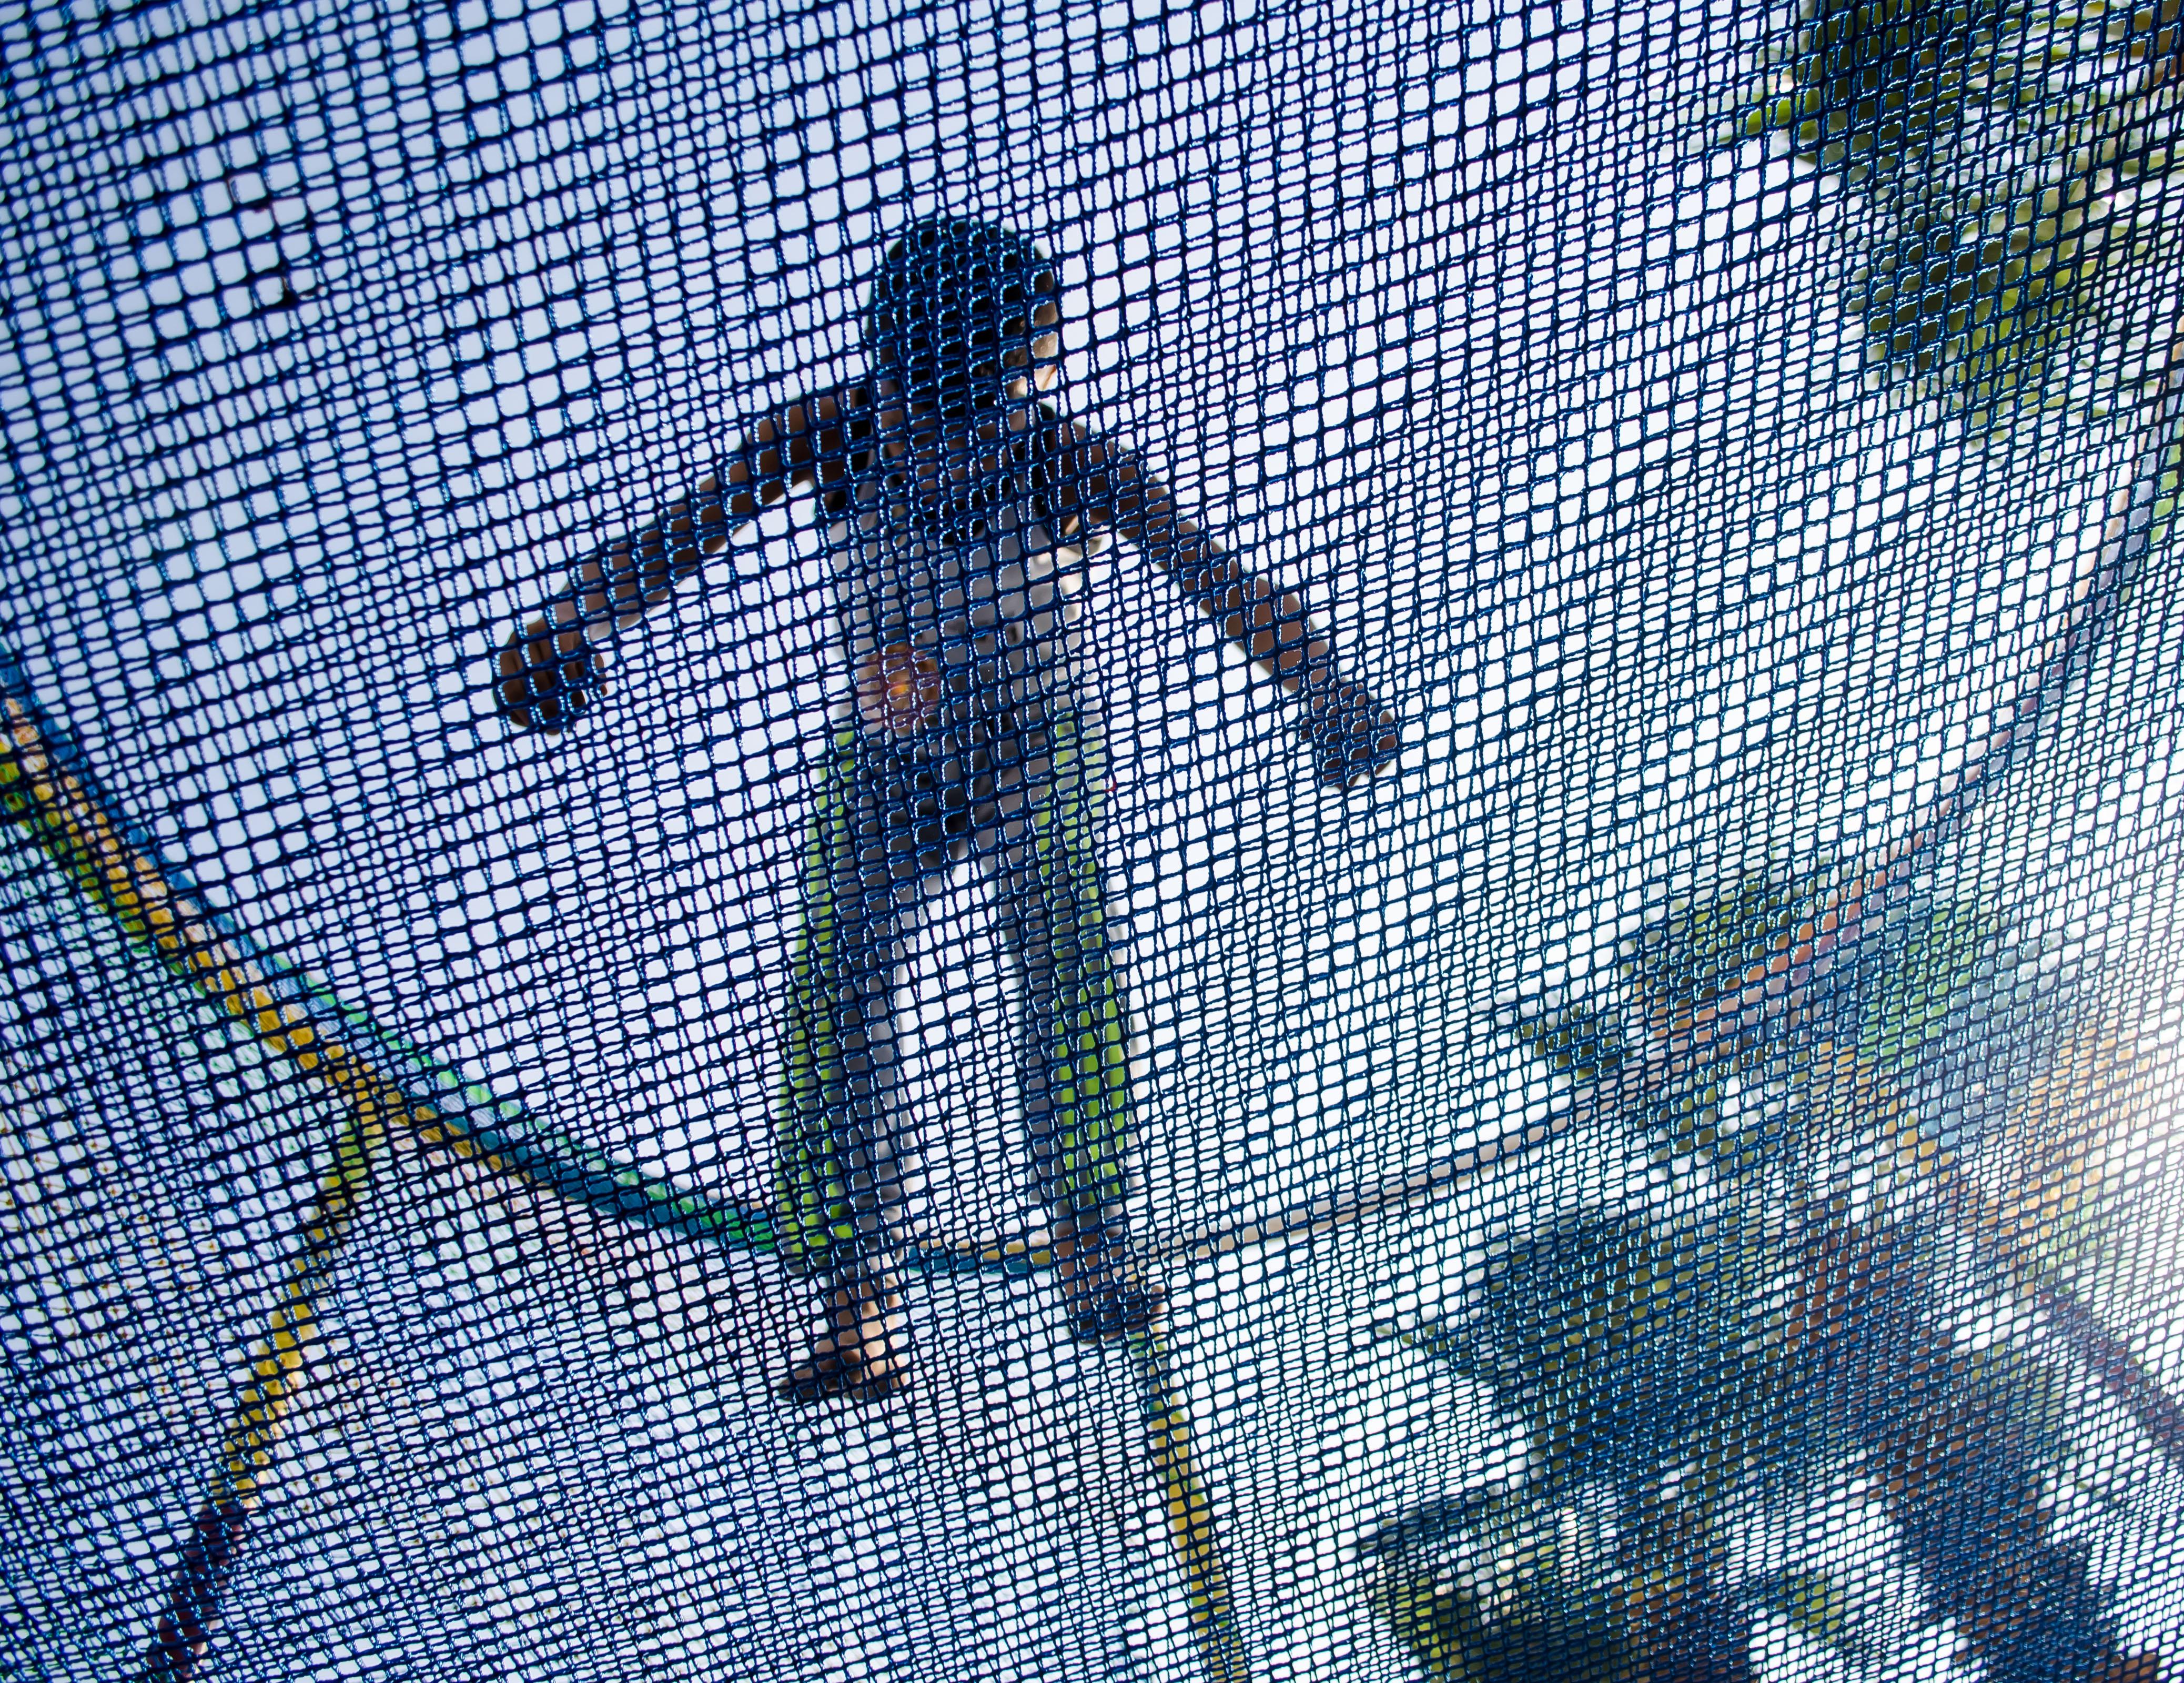 copyright holder of this work, hereby publish it under the following license: English a boy trampolining Arabic صوره توضح طفل اثناء لعب الطفل في الترامبلوين